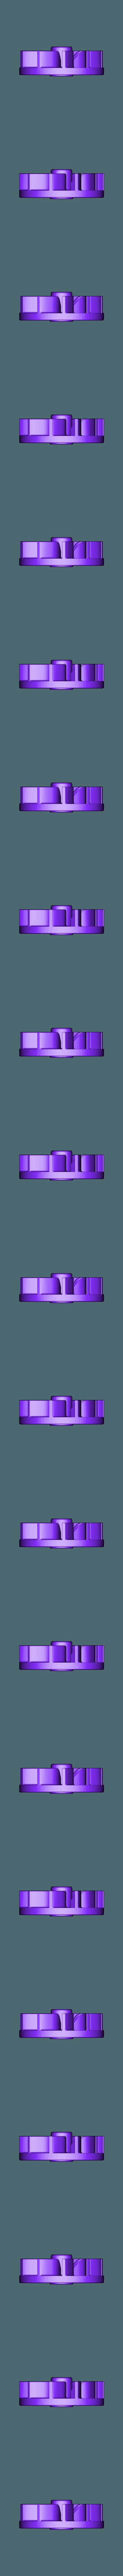 turbina ventiladora.STL Download free STL file ventilating turbine • 3D printing model, jru